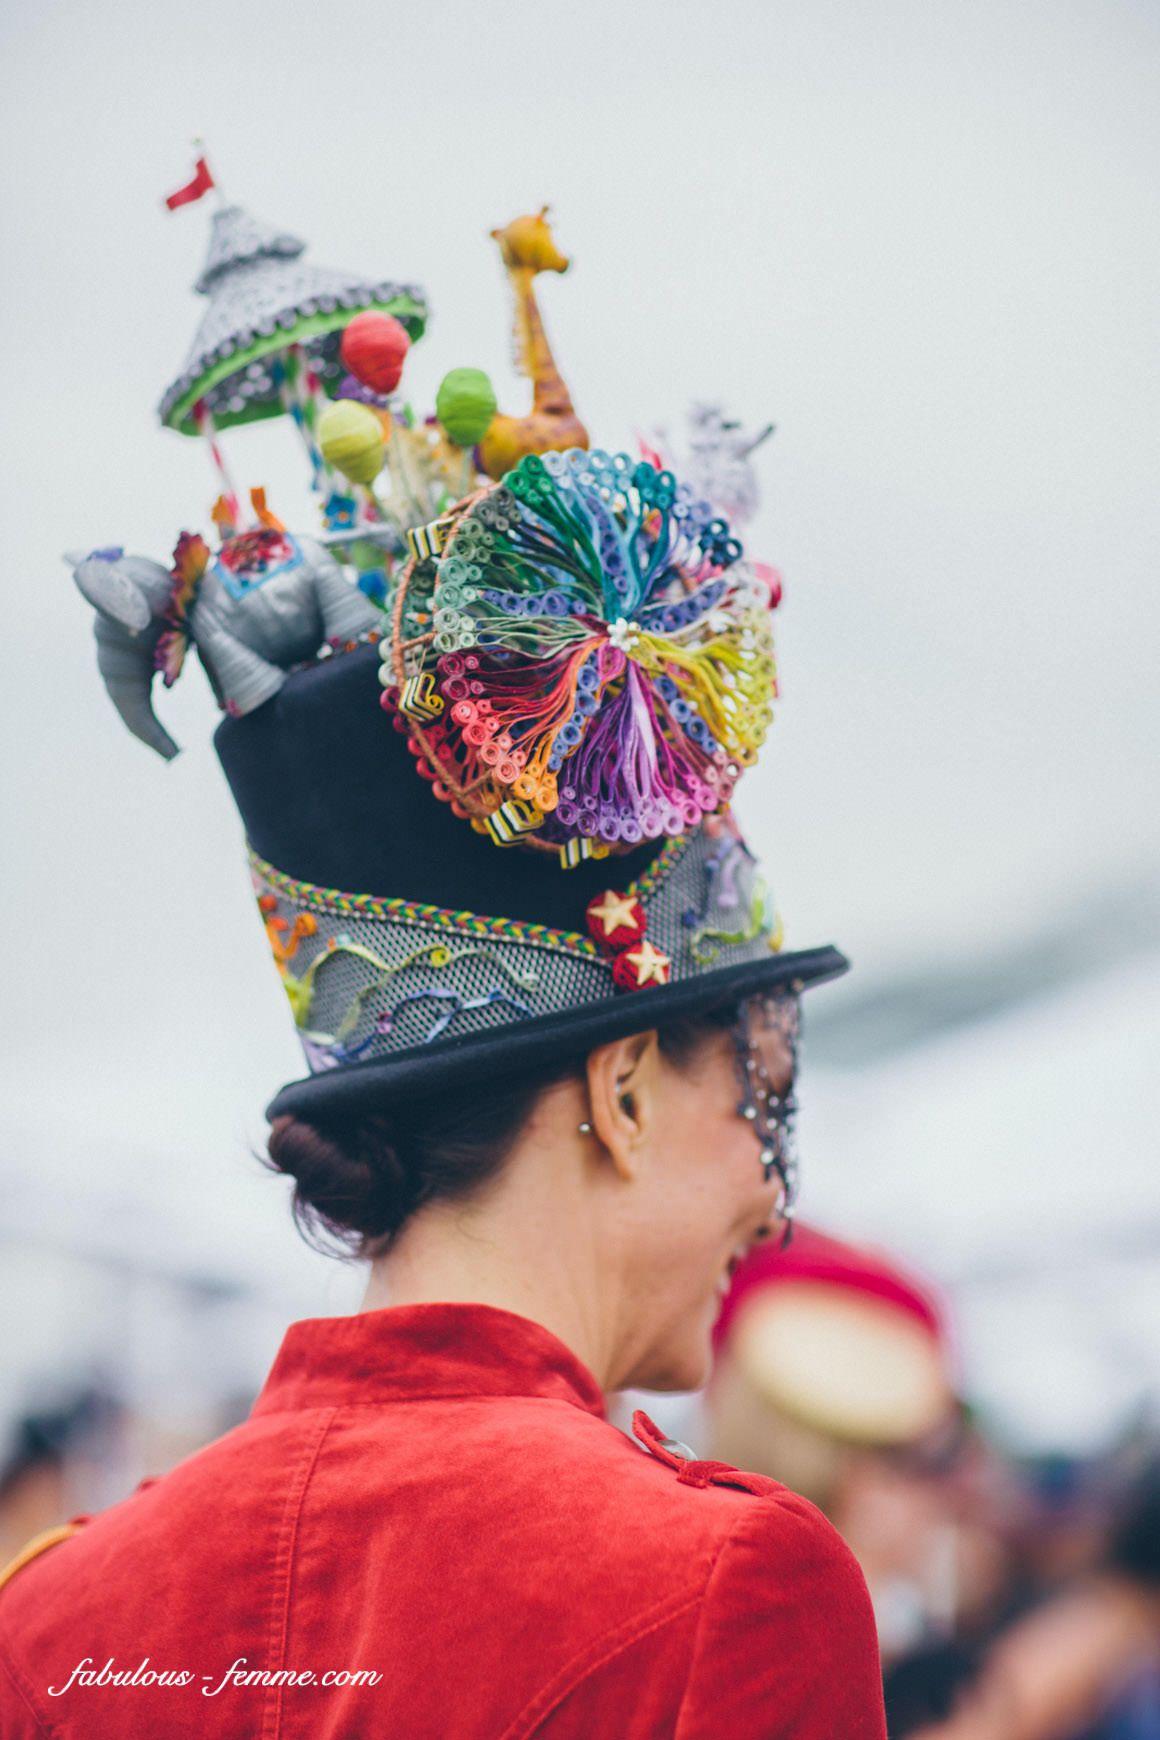 hats crazy #crazyhatdayideas